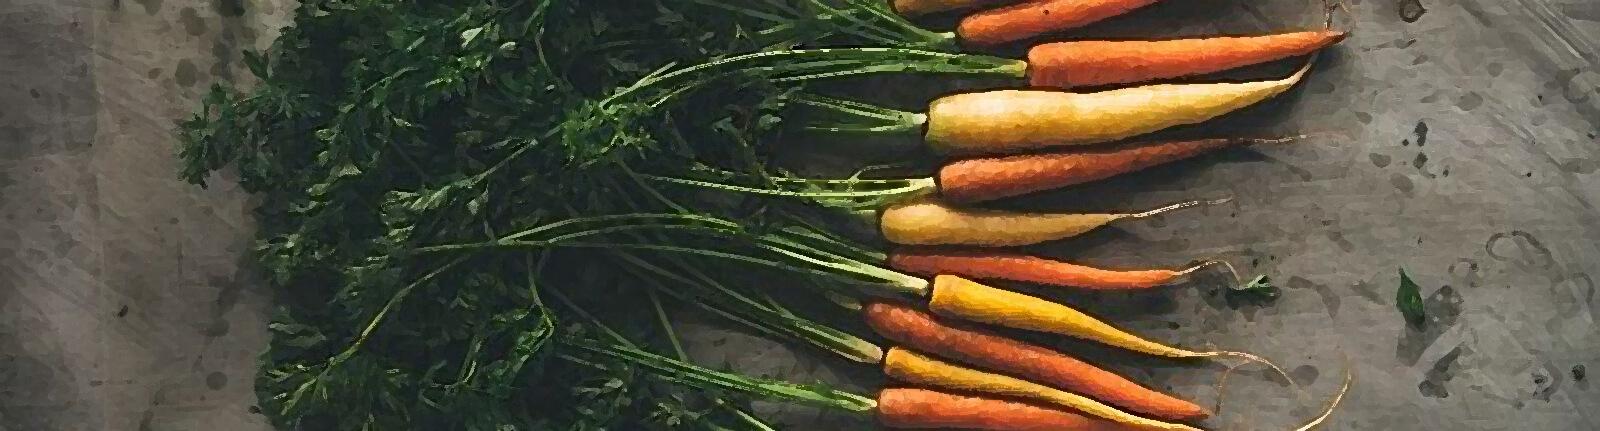 mercato contadino carote